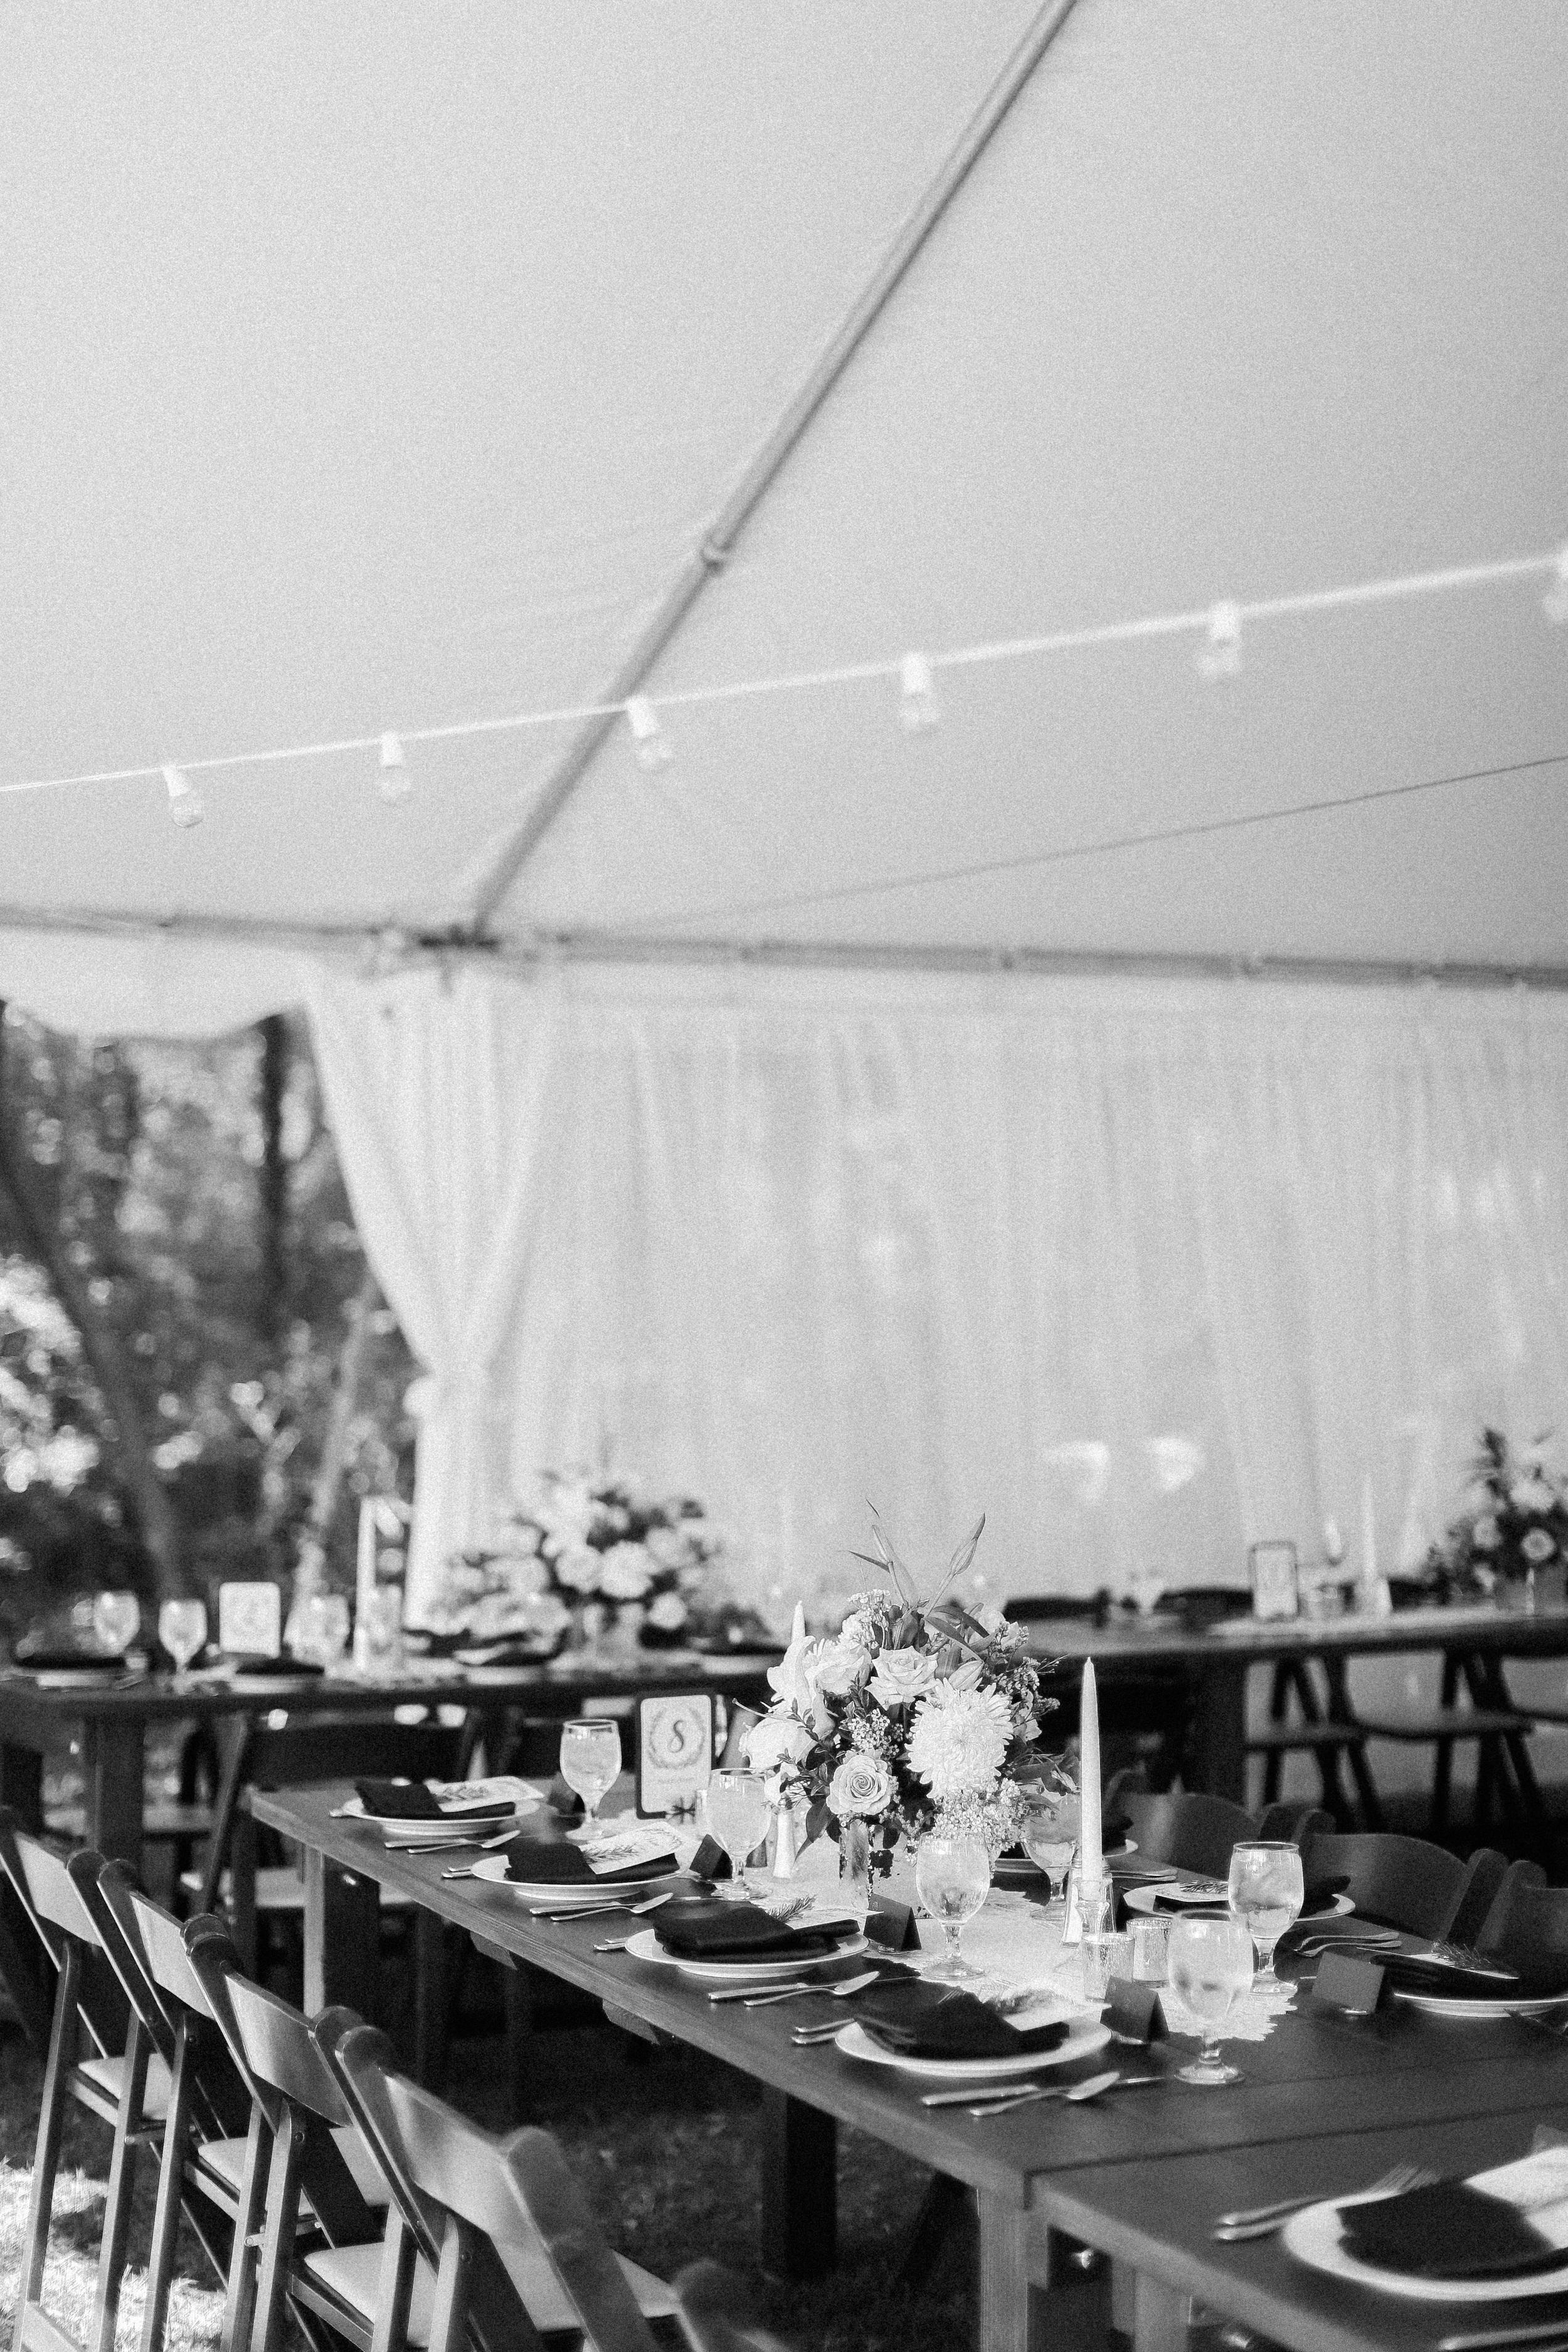 sedona-creekside-inn-wedding-brealyn-nenes